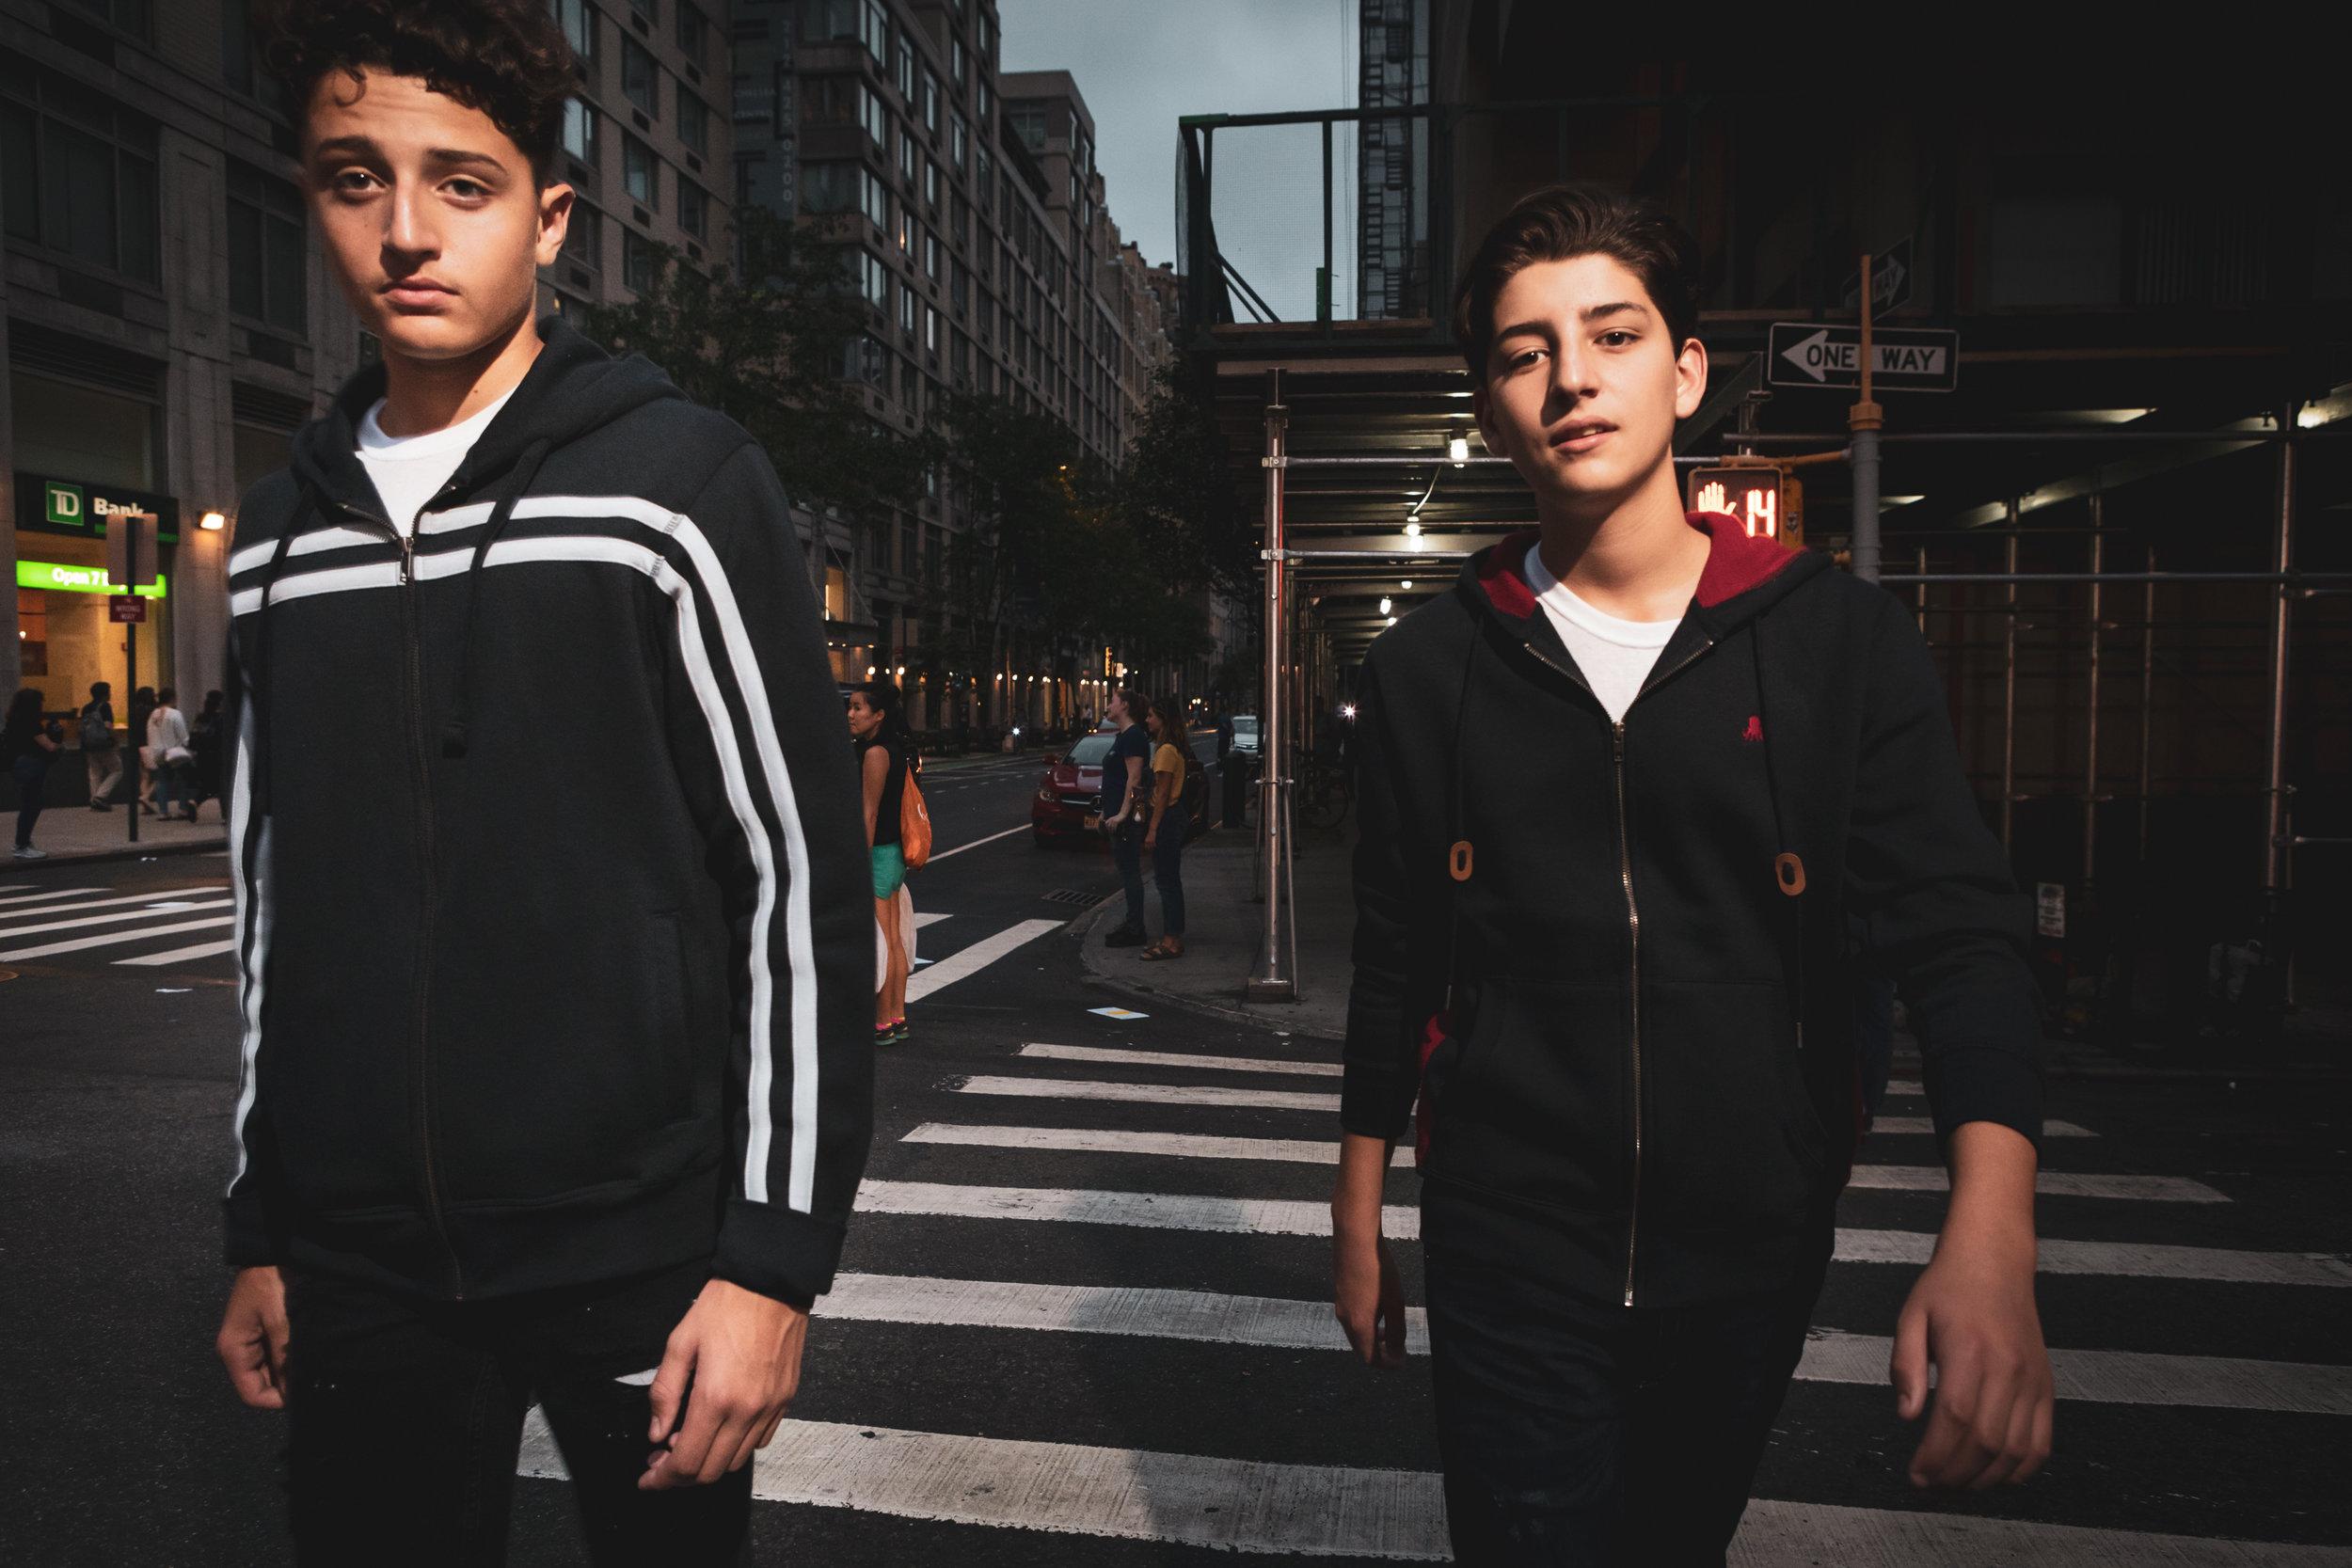 031_087_Z8 Clothing - NYC - Dario and Luke_3000px.jpg